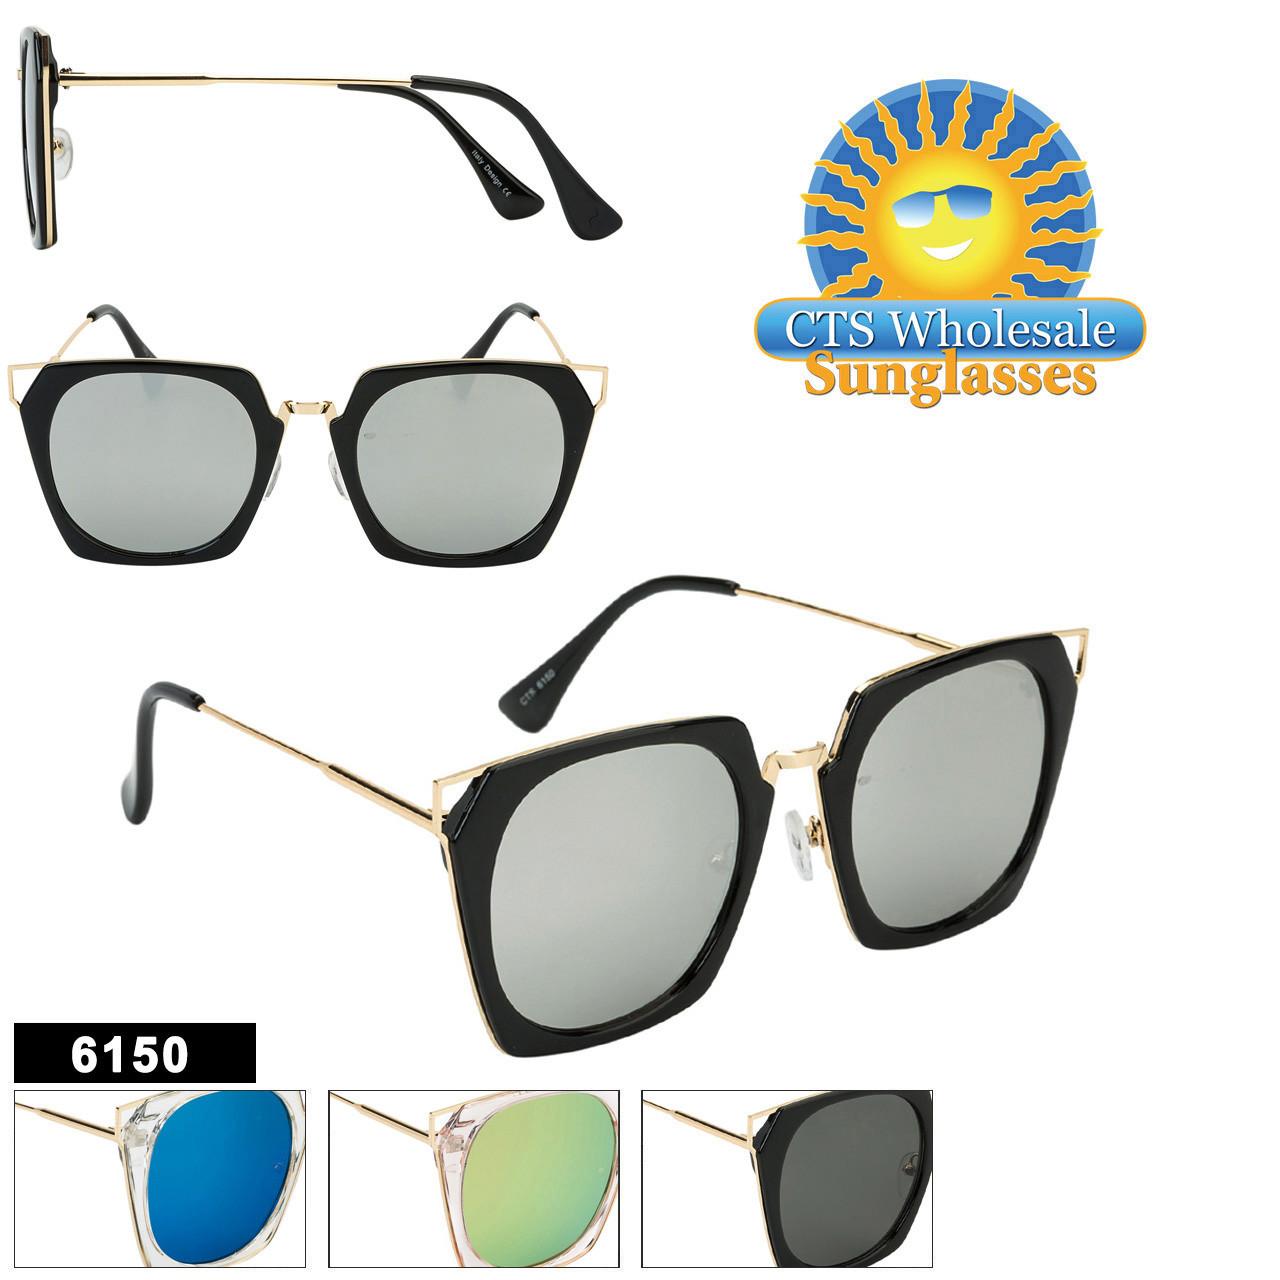 Retro Mirrored Women's Sunglasses - Style #6150